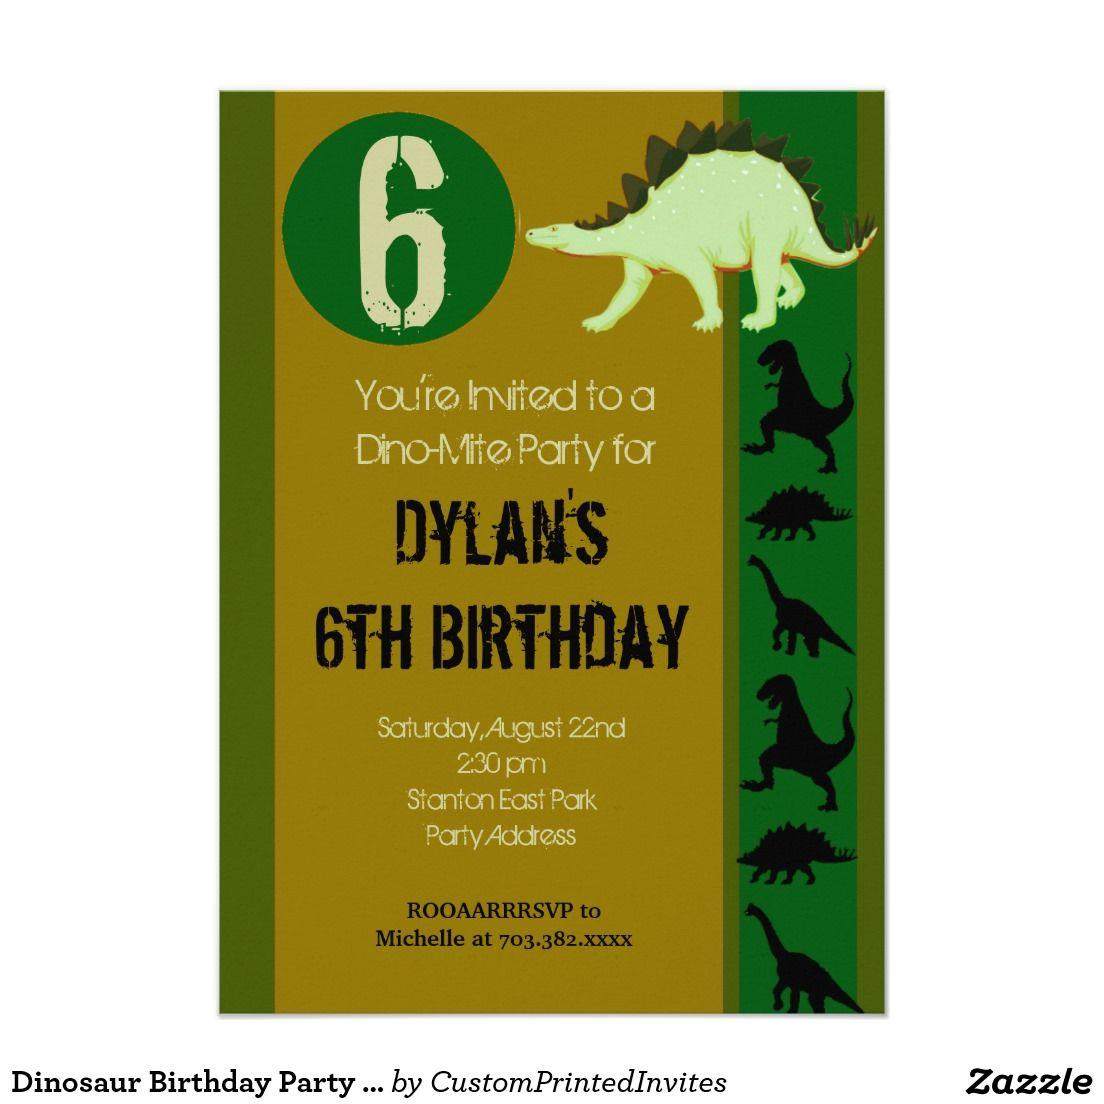 Dinosaur Birthday Party Invitations Earth Tones SOLD on Zazzle ...